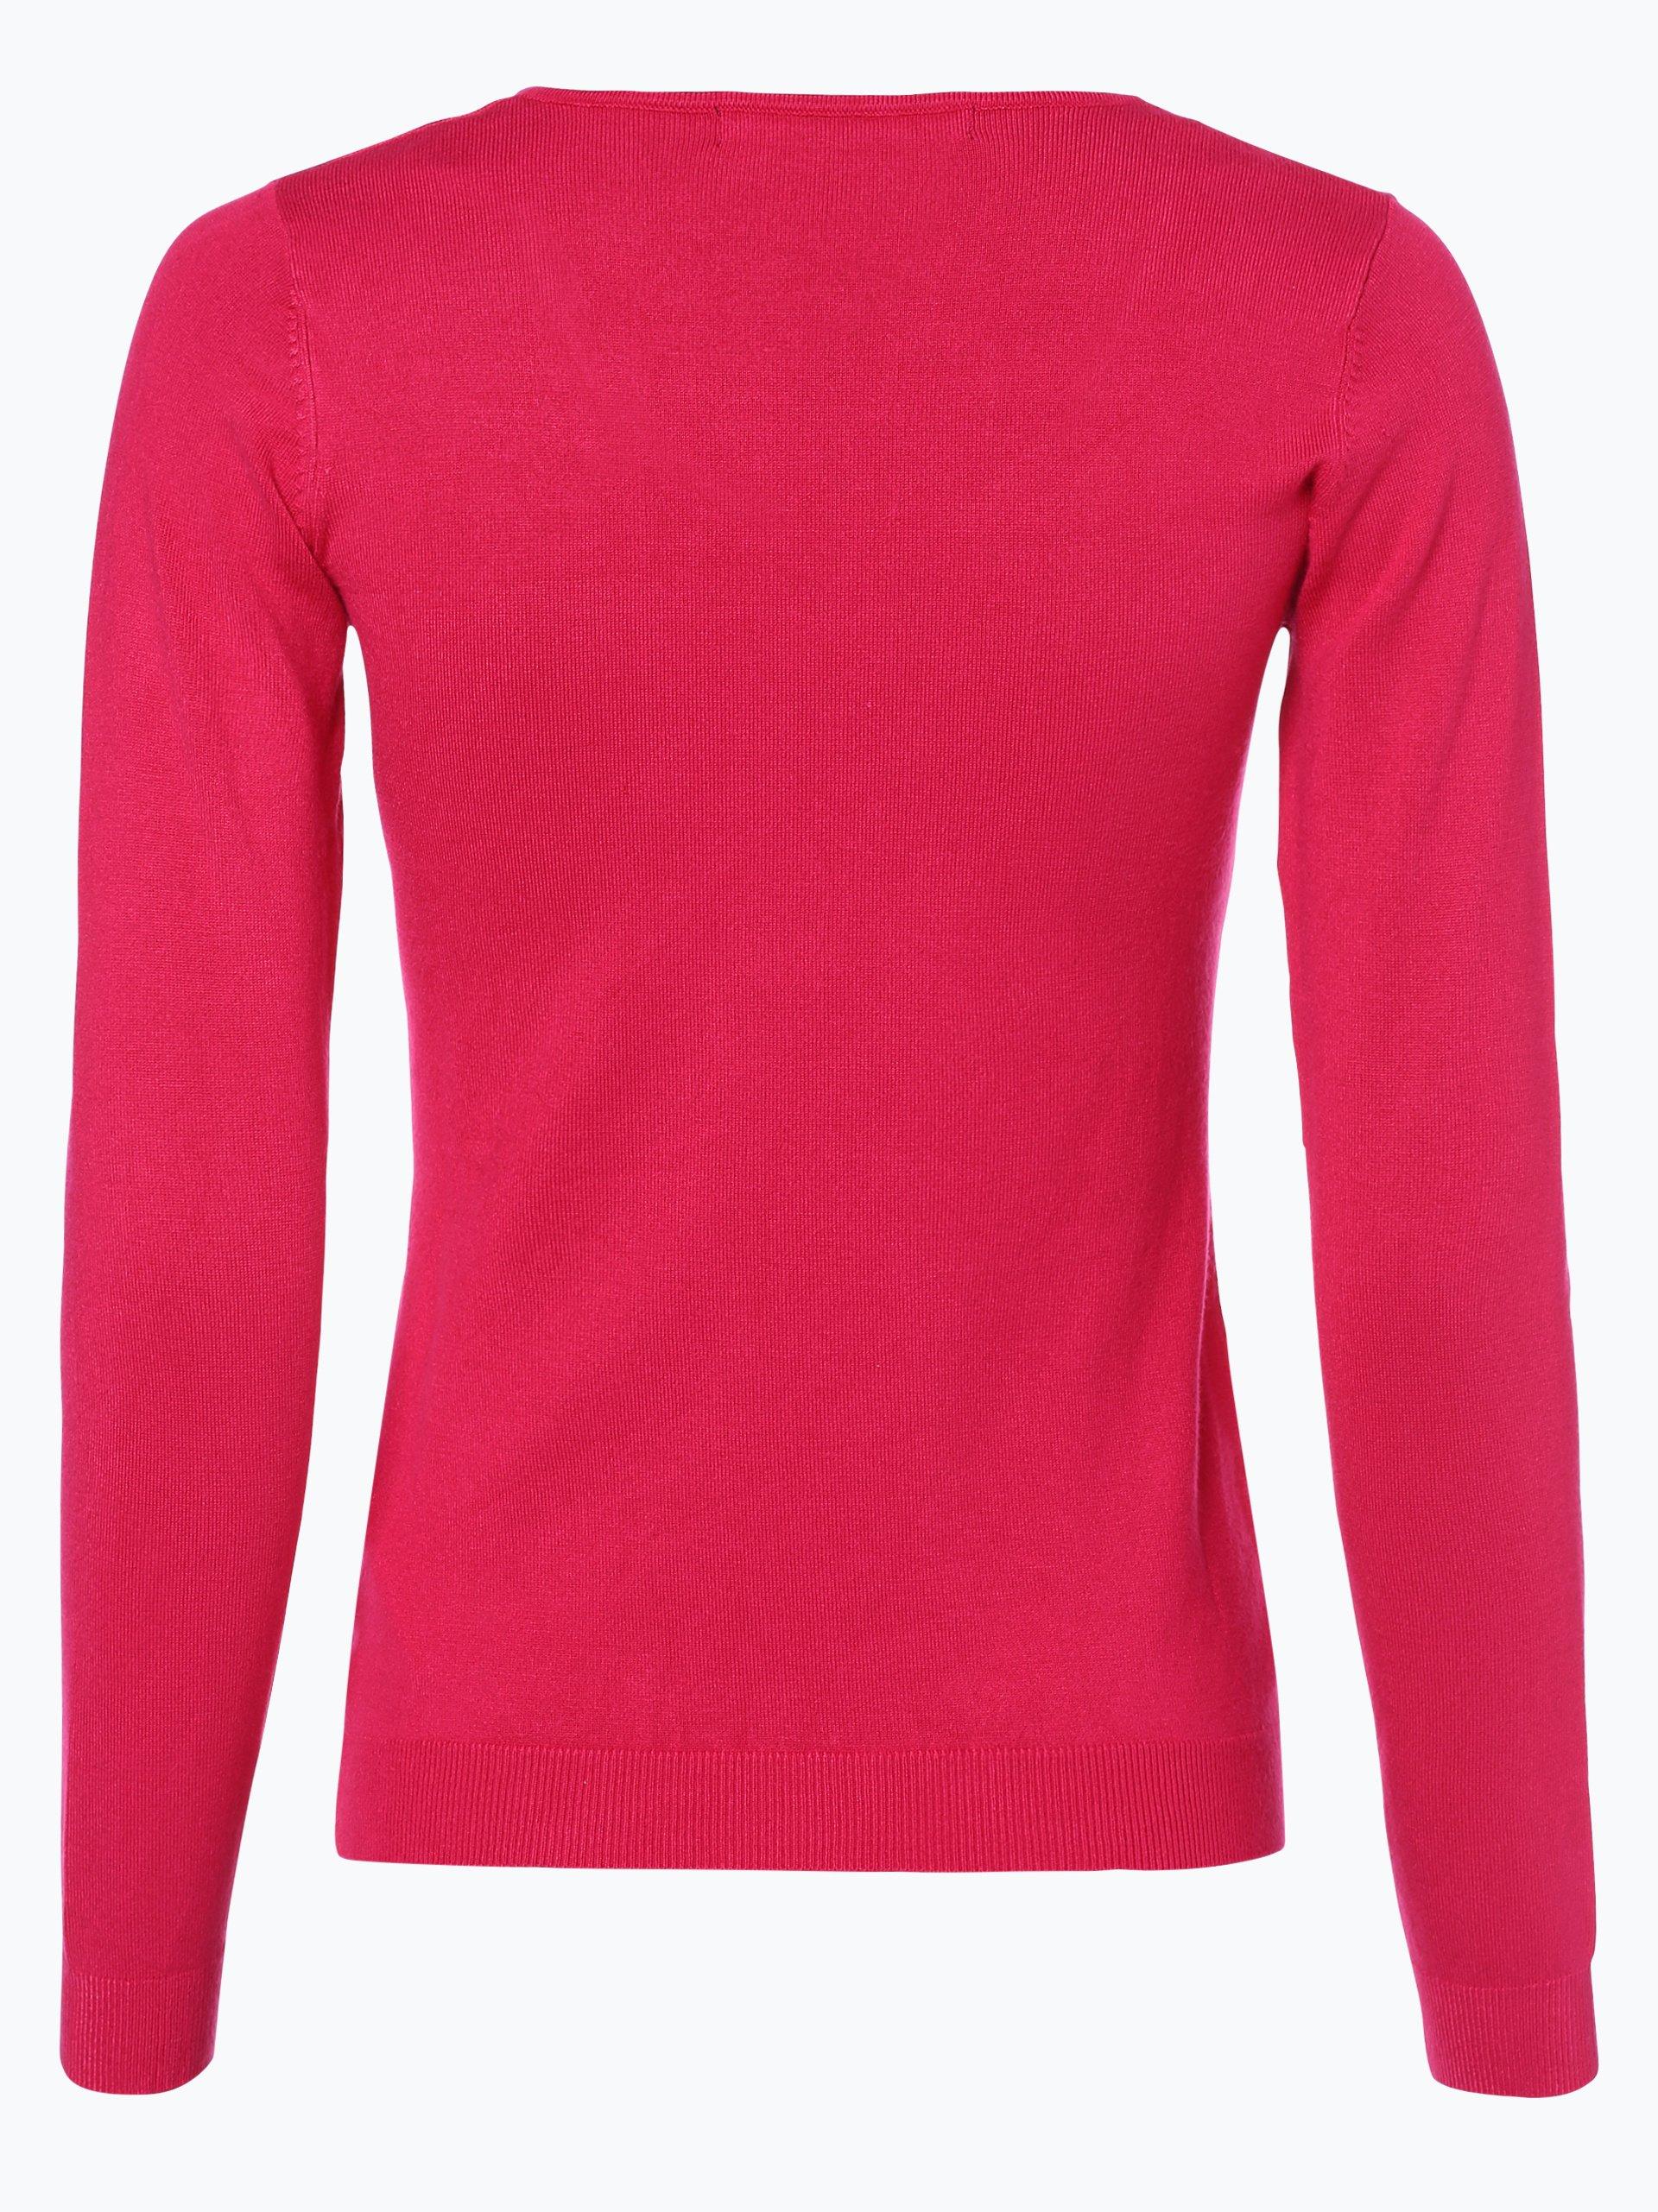 guess jeans damen pullover pink gemustert online kaufen peek und cloppenburg de. Black Bedroom Furniture Sets. Home Design Ideas